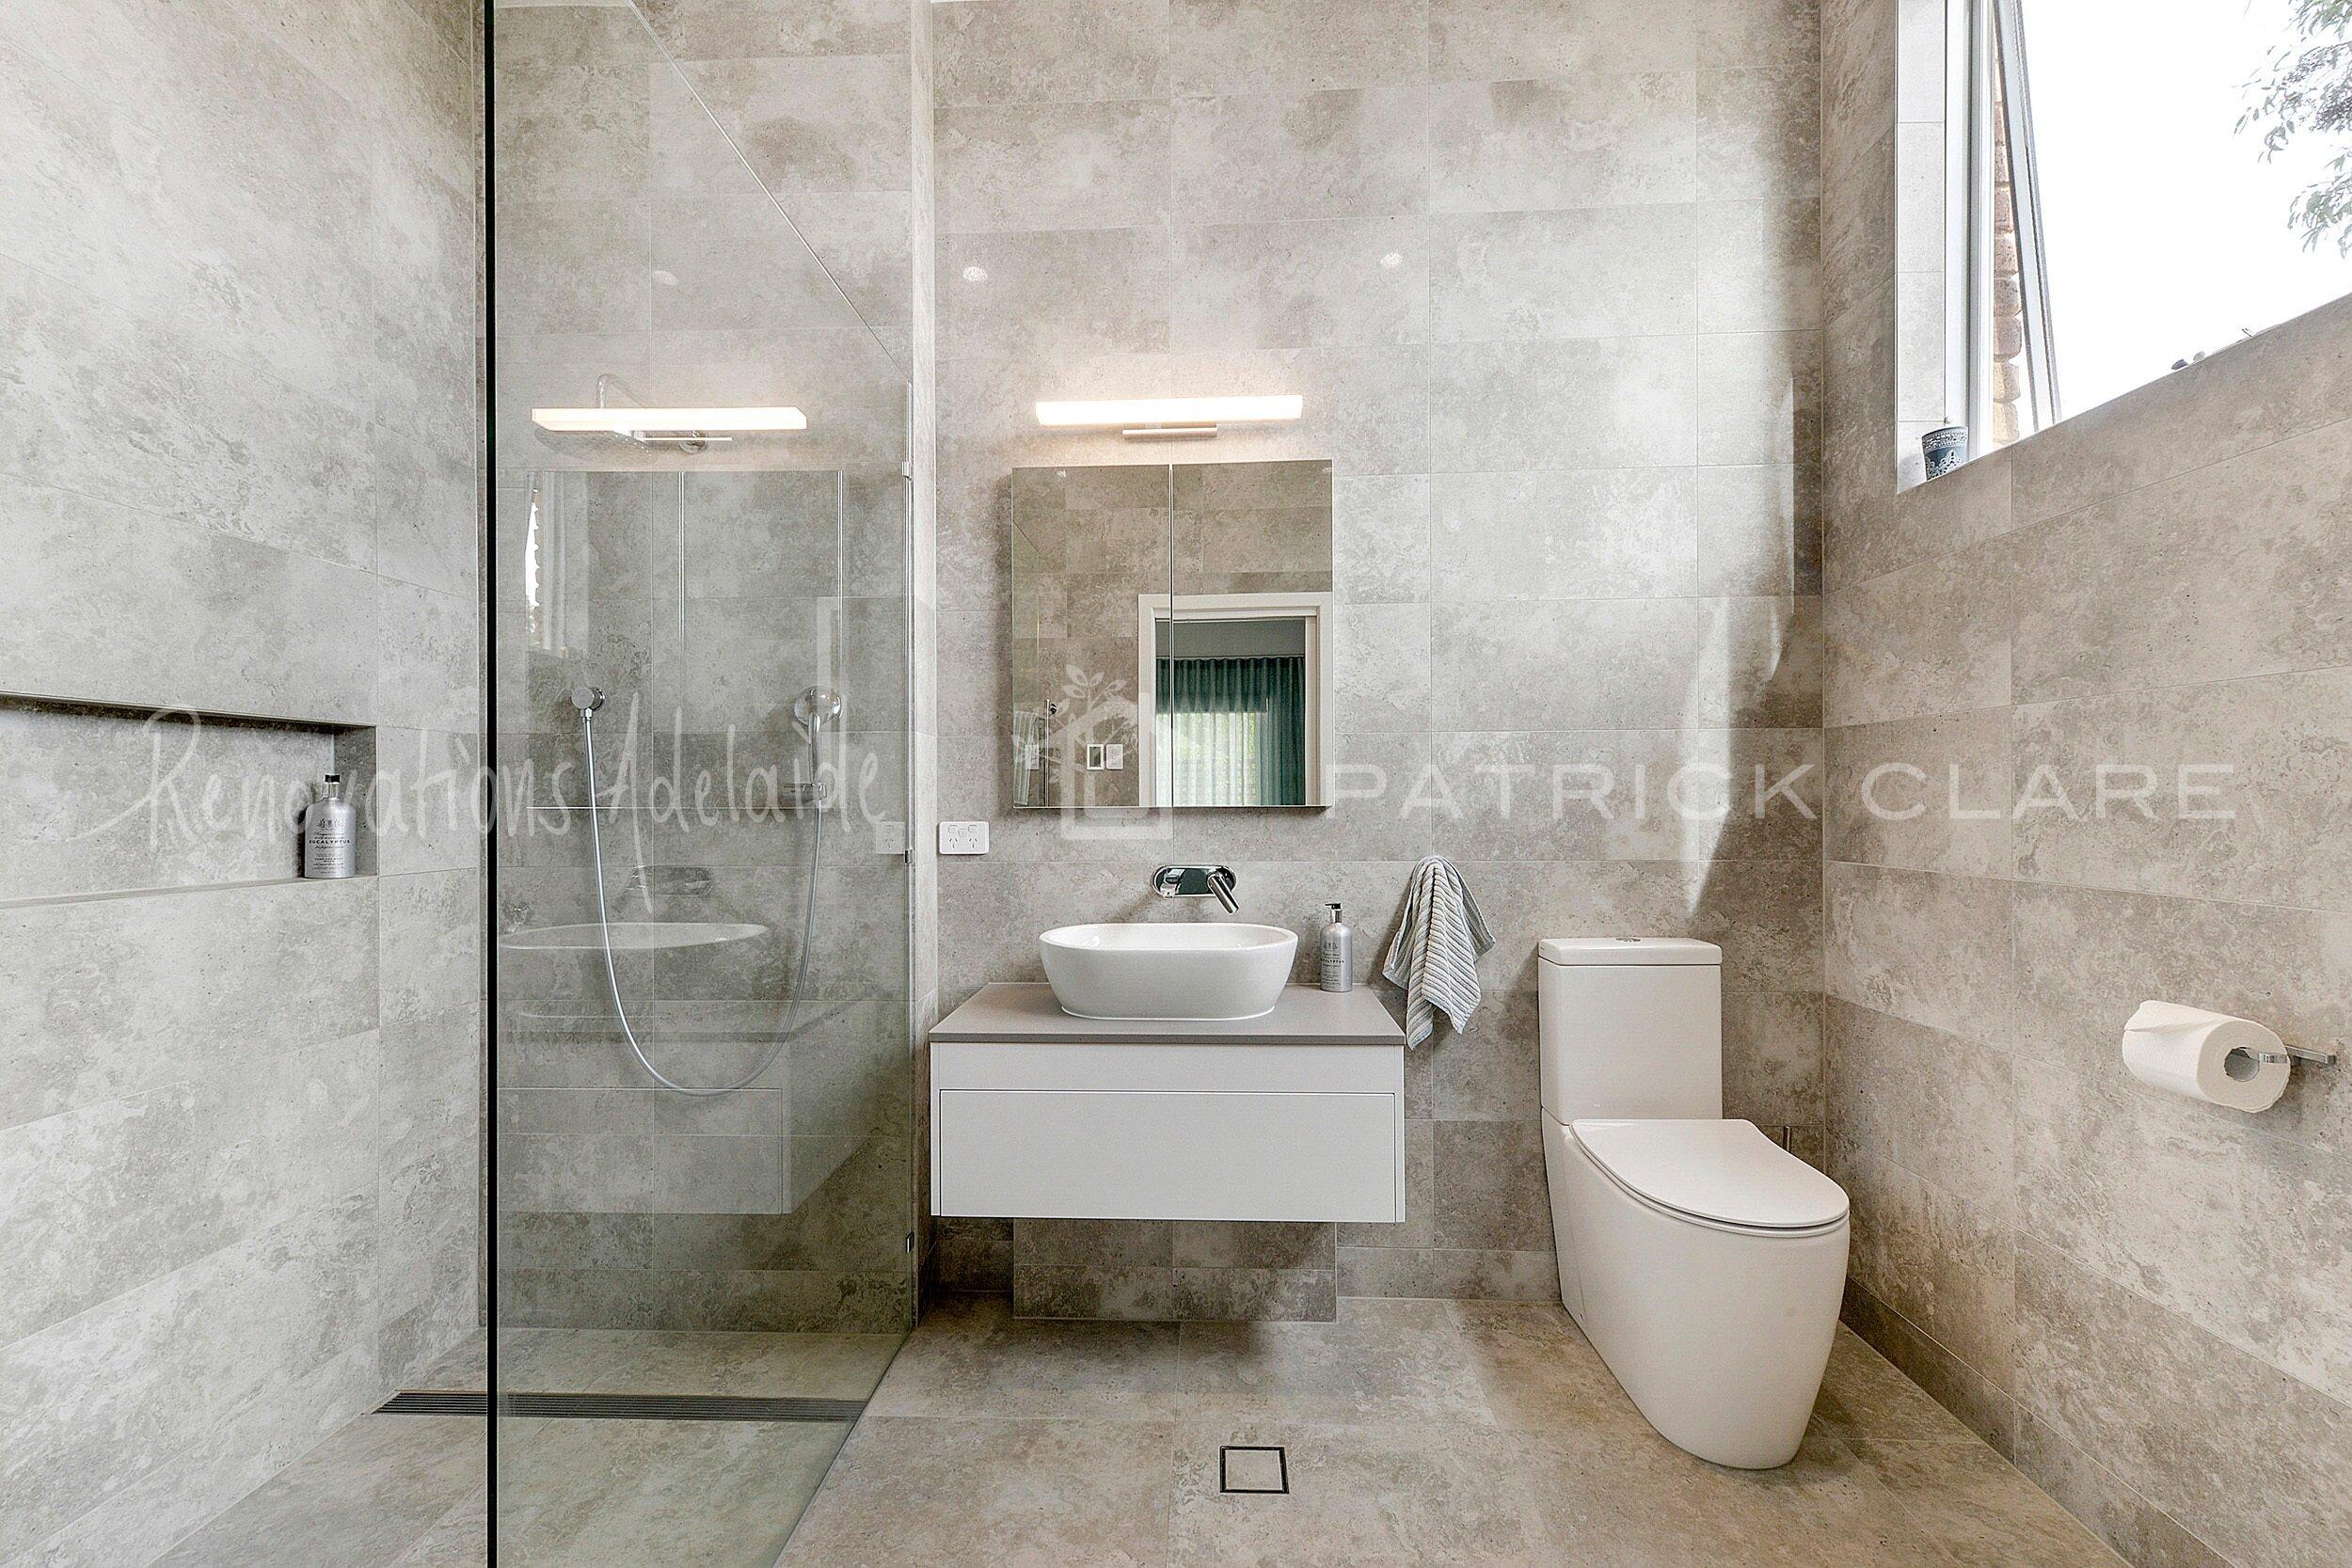 Bathroom Renovations Adelaide - Bathroom Designers - Patrick Clare